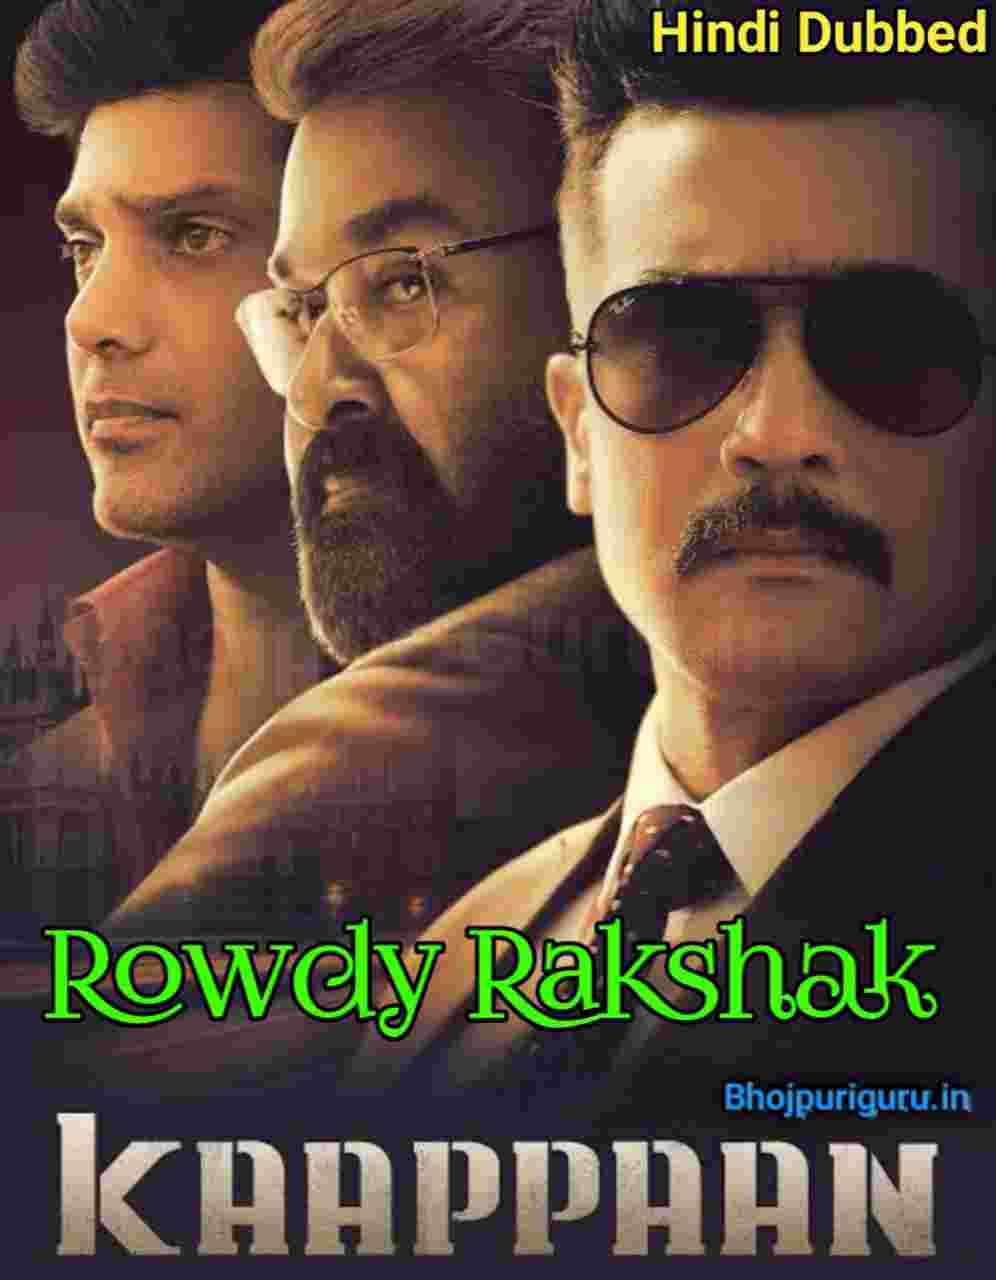 Rowdy Rakshak 2021 Hindi Dubbed Full Movie Download filmy4wap